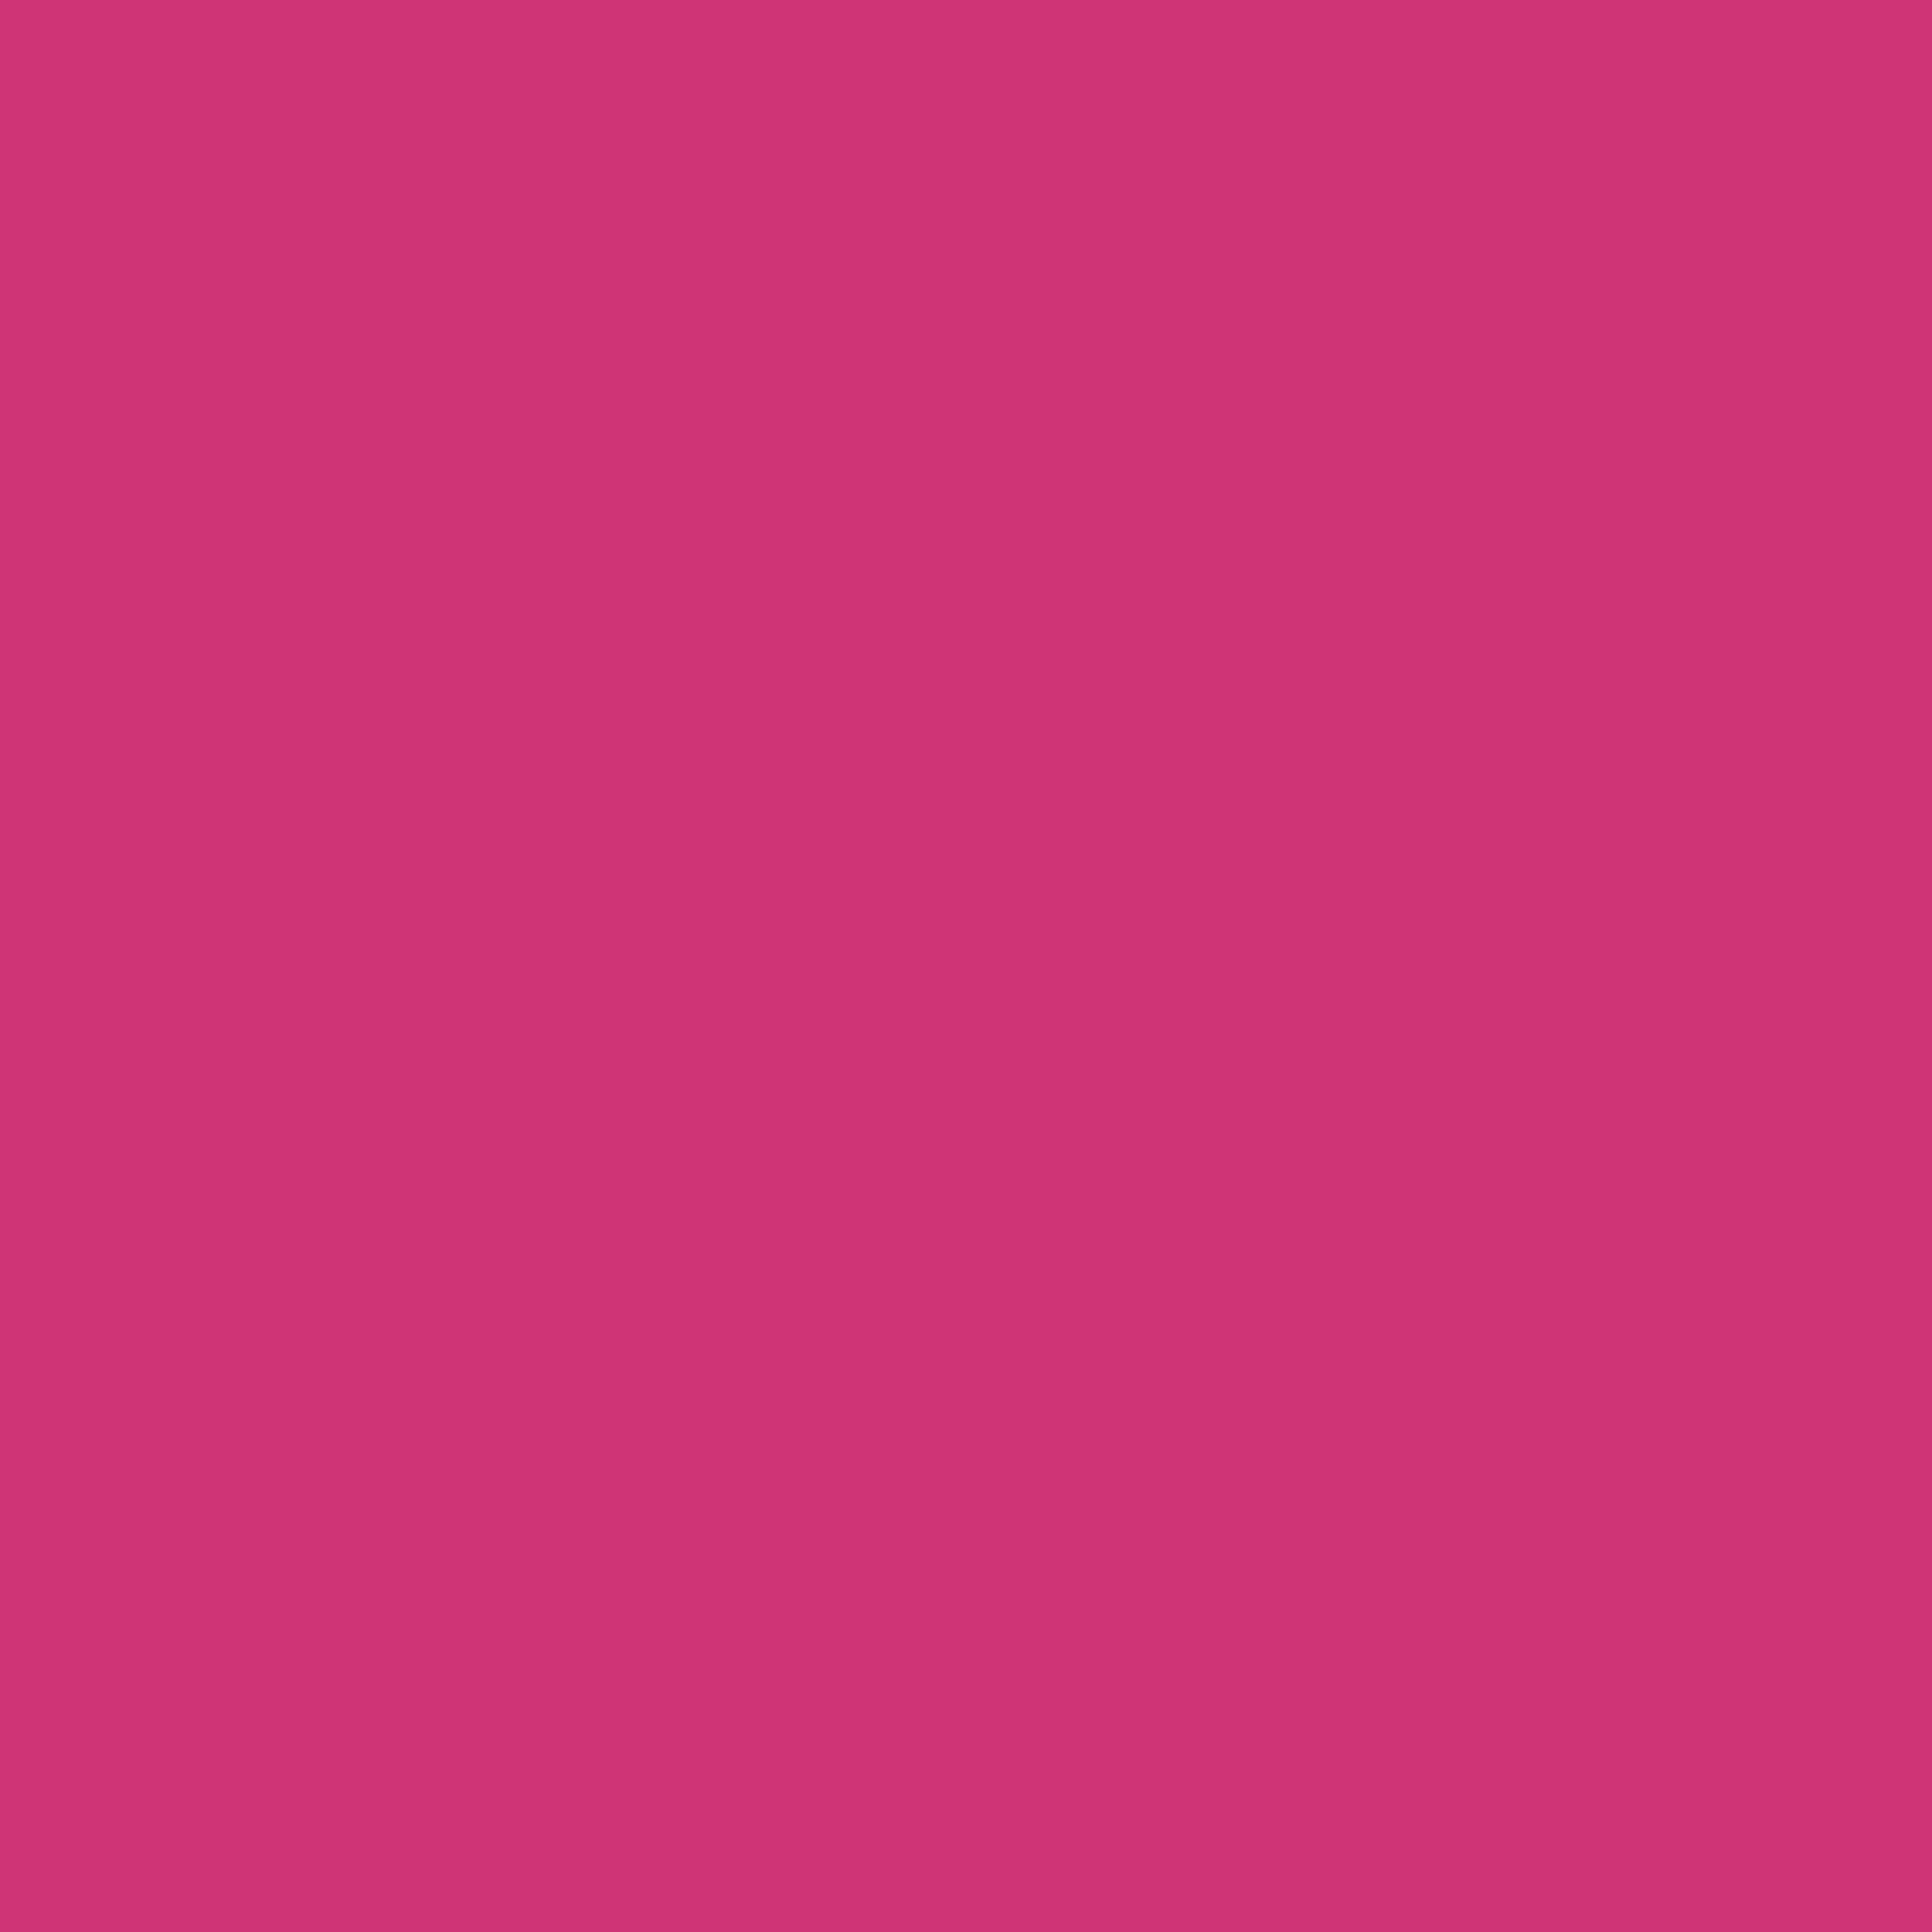 2048x2048 Telemagenta Solid Color Background